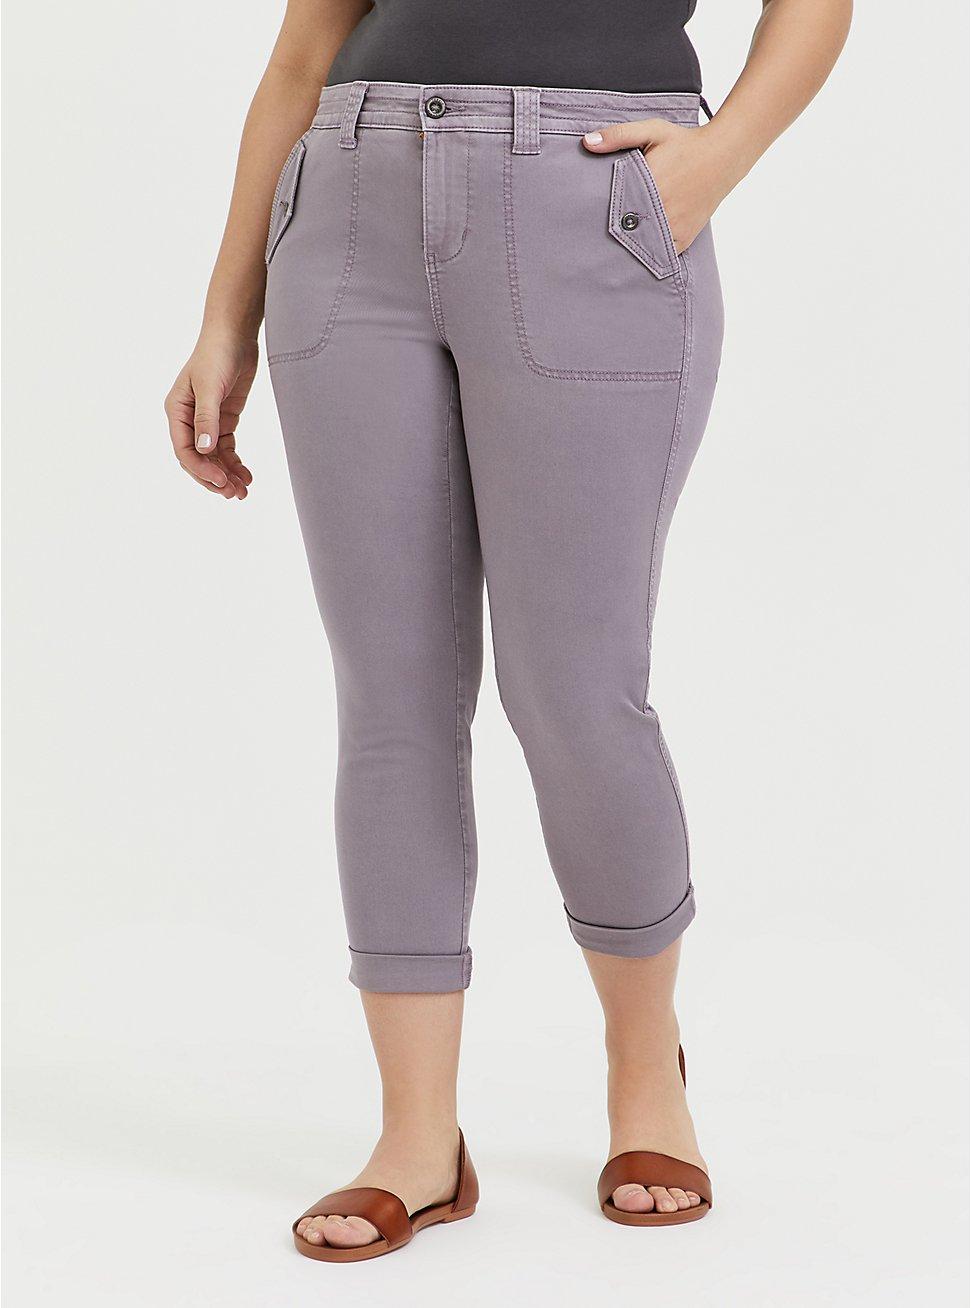 Crop Military Pant - Twill Slate Grey , GRAY RIDGE, hi-res